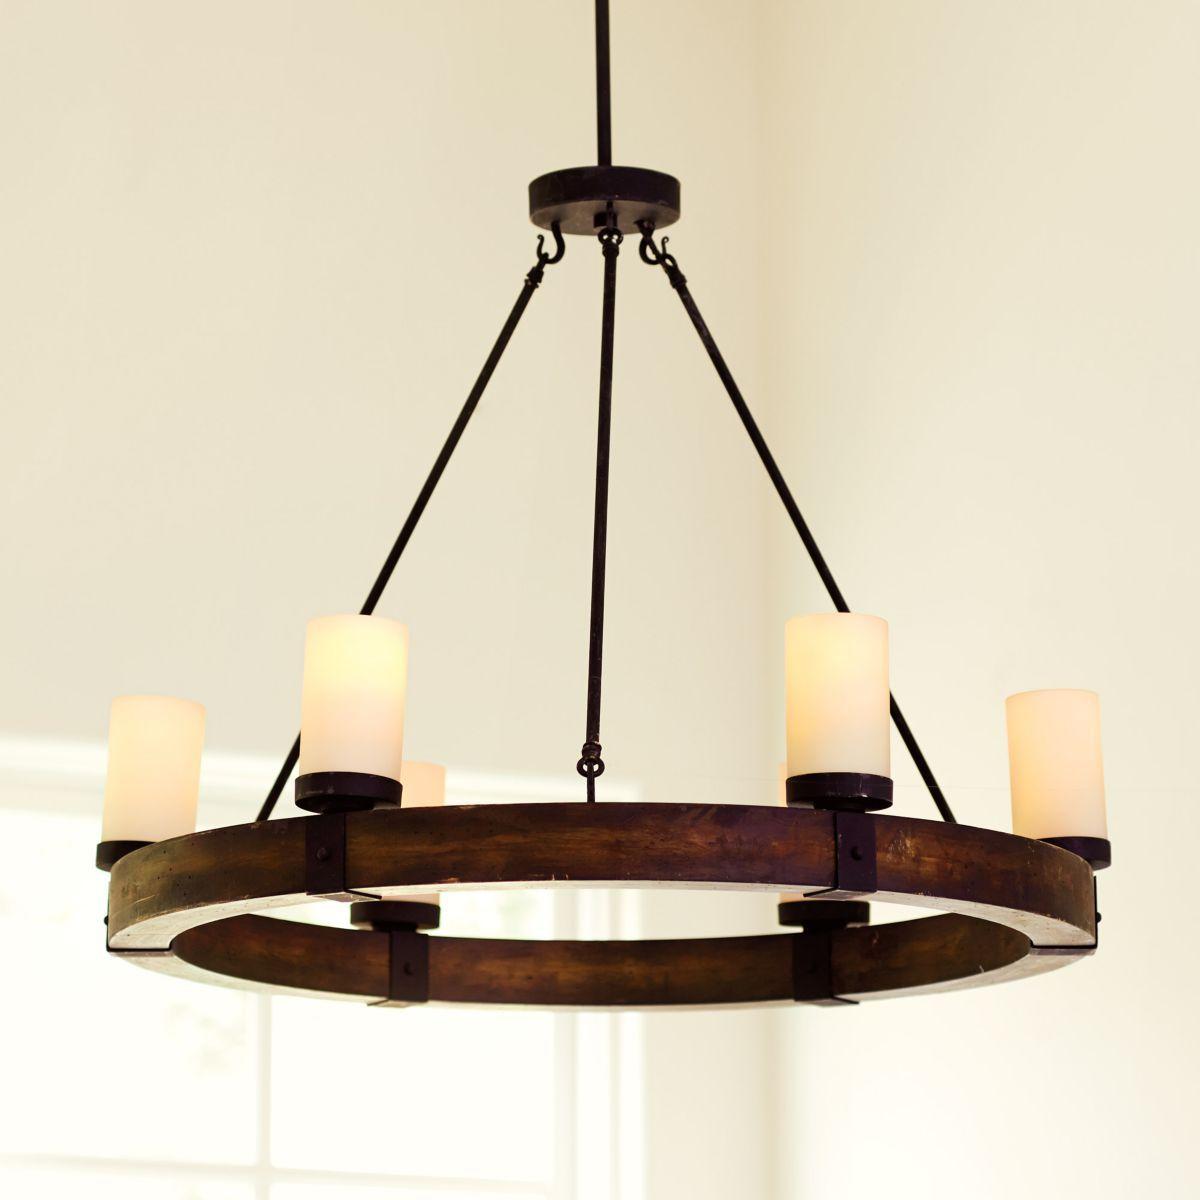 modway black rectangular chandelier arturo bridge pinterest style candle in steel gagny pin light